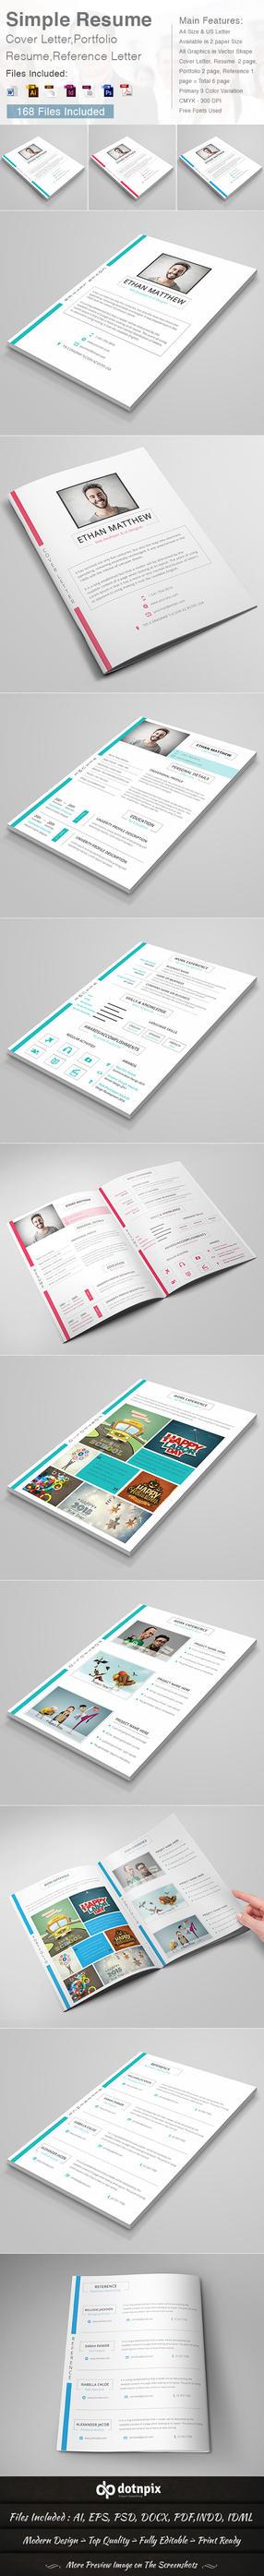 Simple Resume by dotnpix